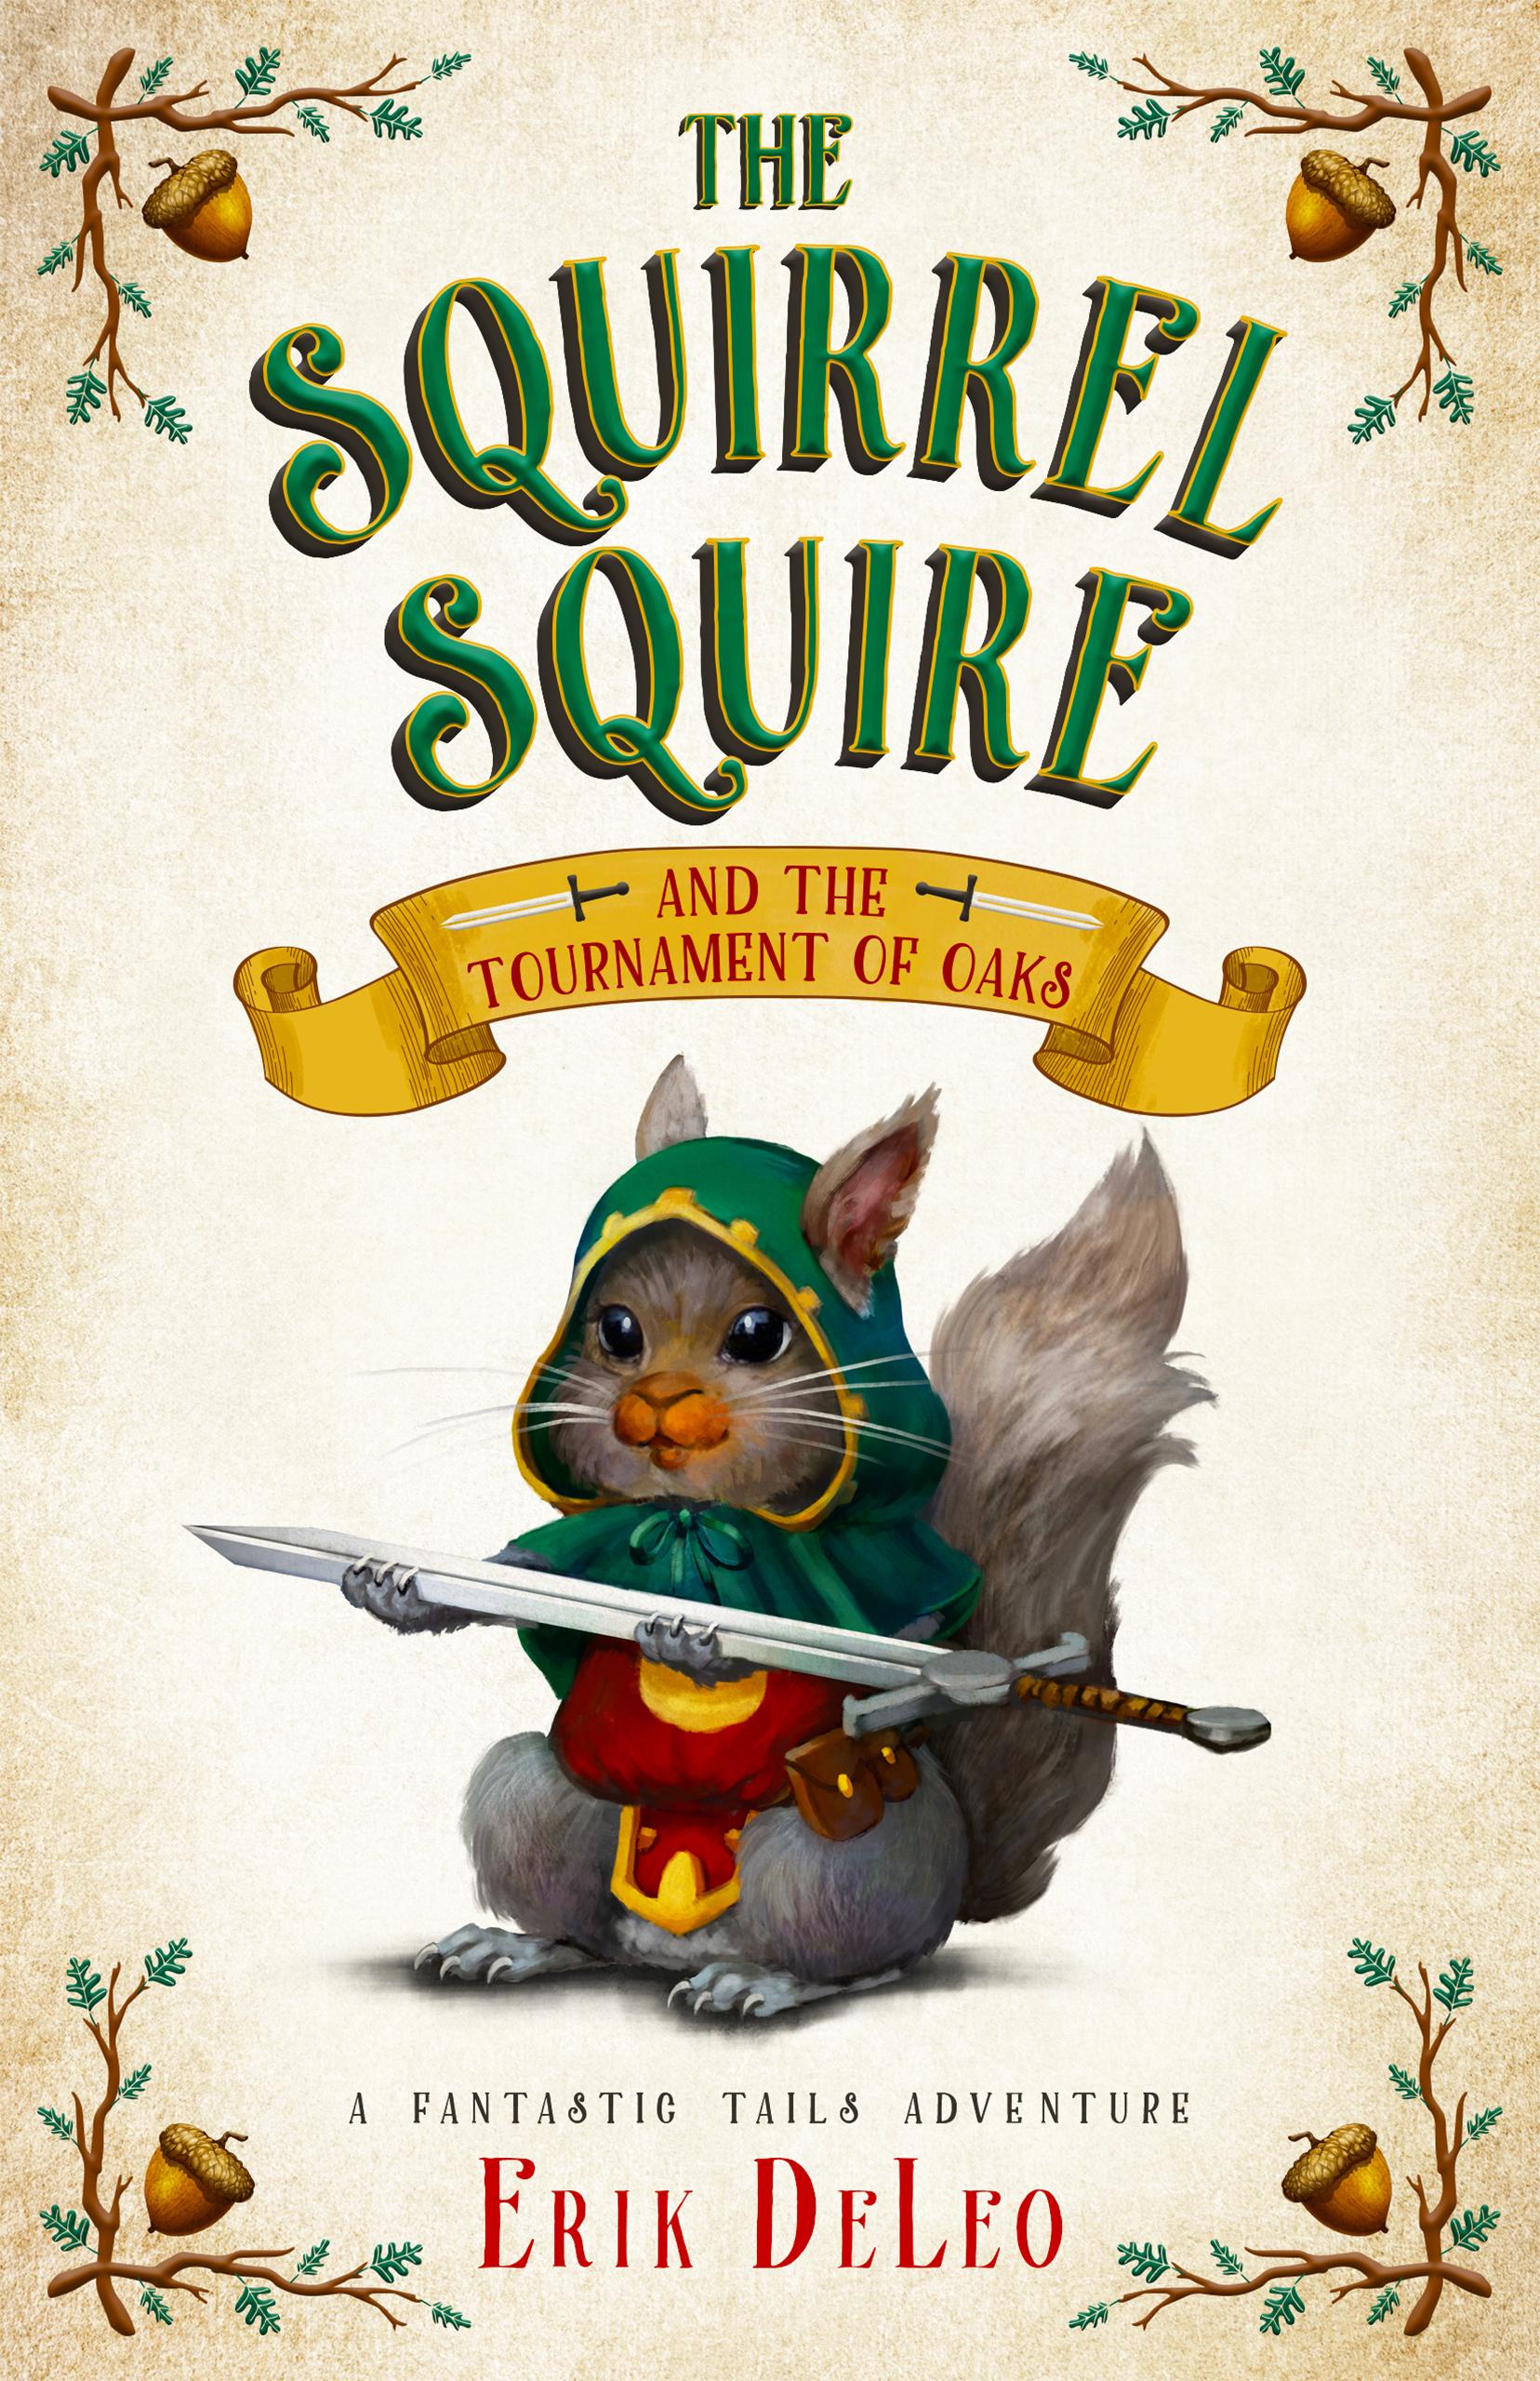 Squirrel Squire Hi Res BIG.jpg